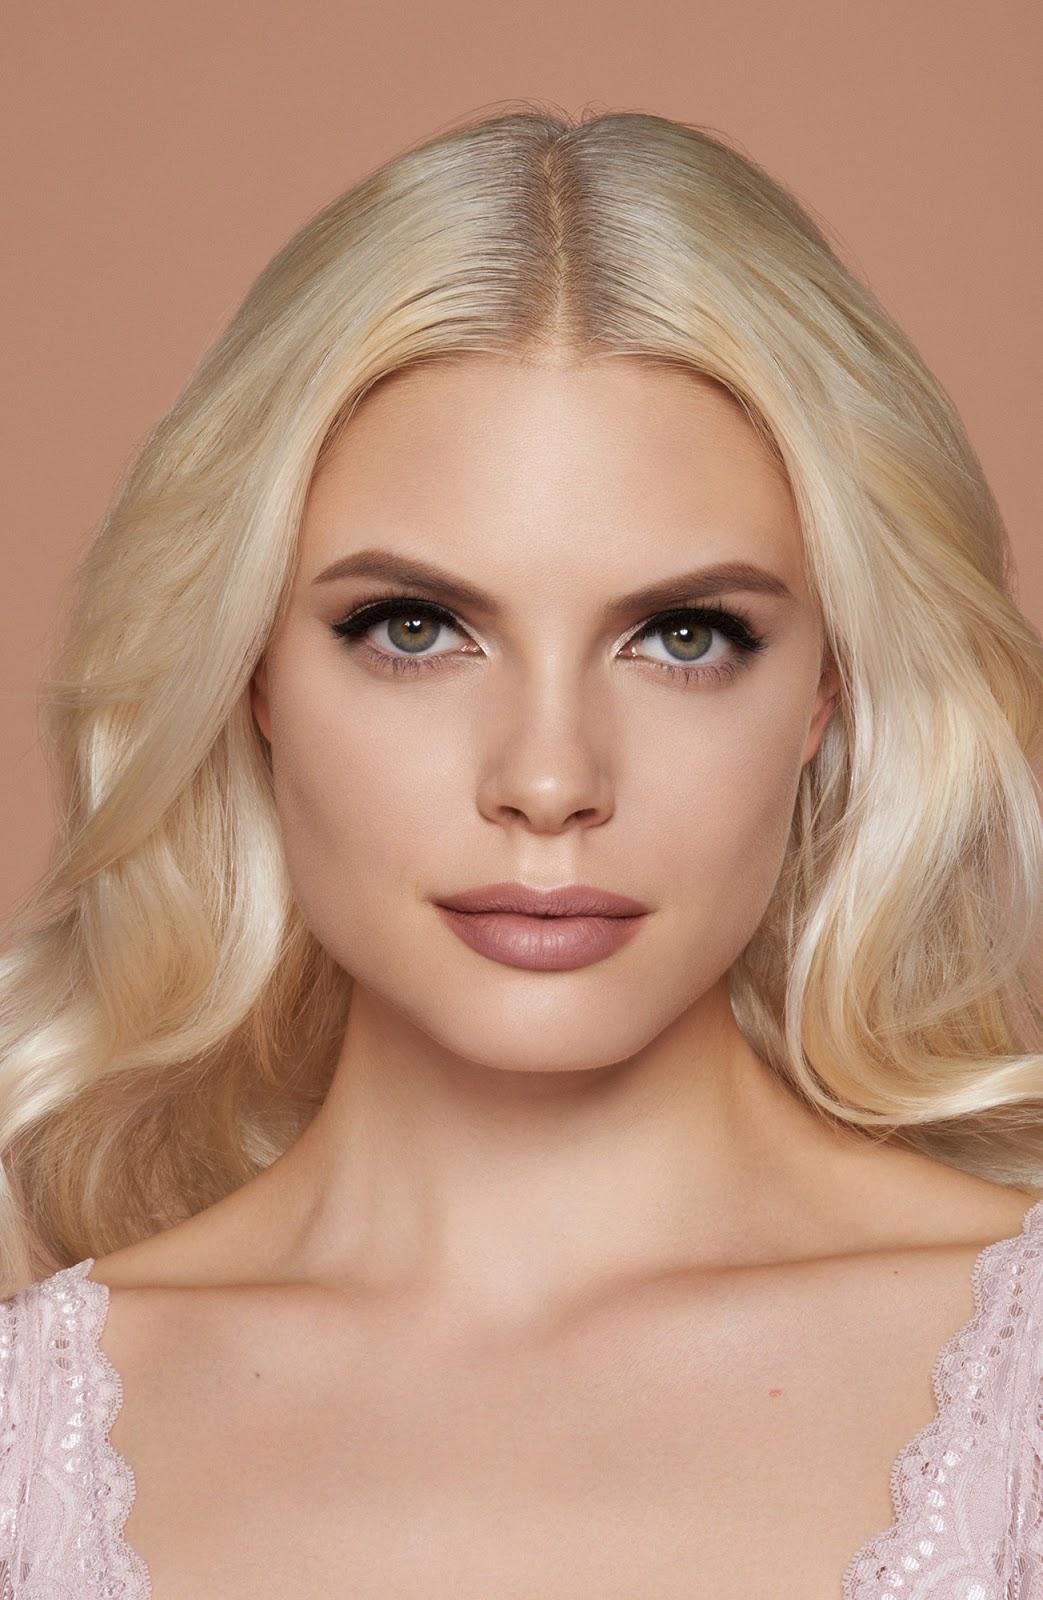 Tarte Cosmetics Advertising Campaign Rethink Natural